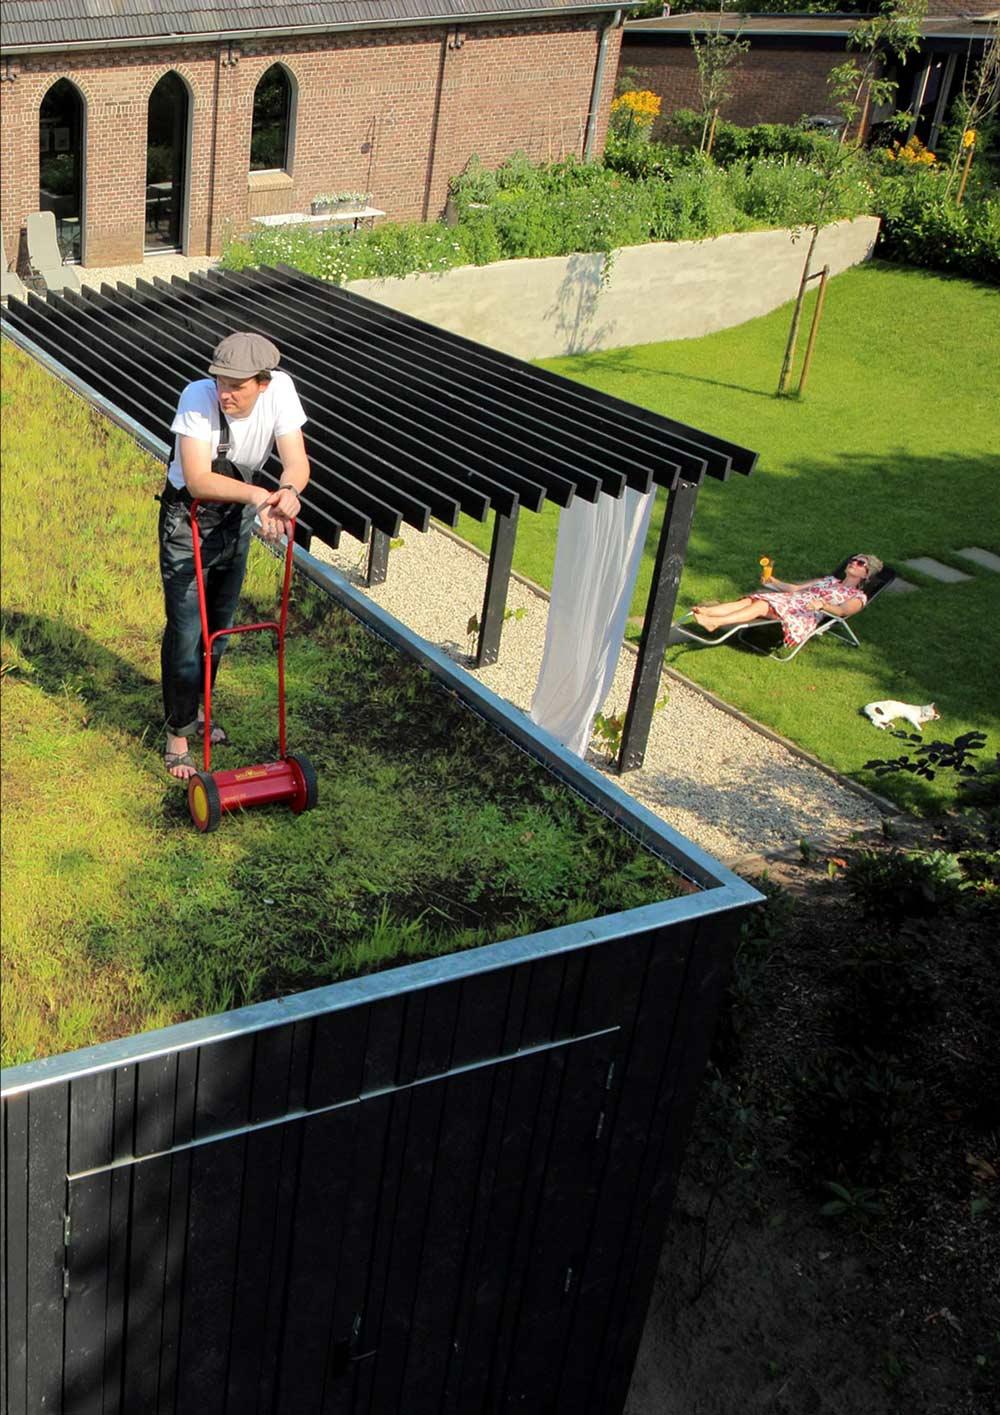 Roof Top Lawn, Pergola, Unique Loft Conversion in The Netherlands